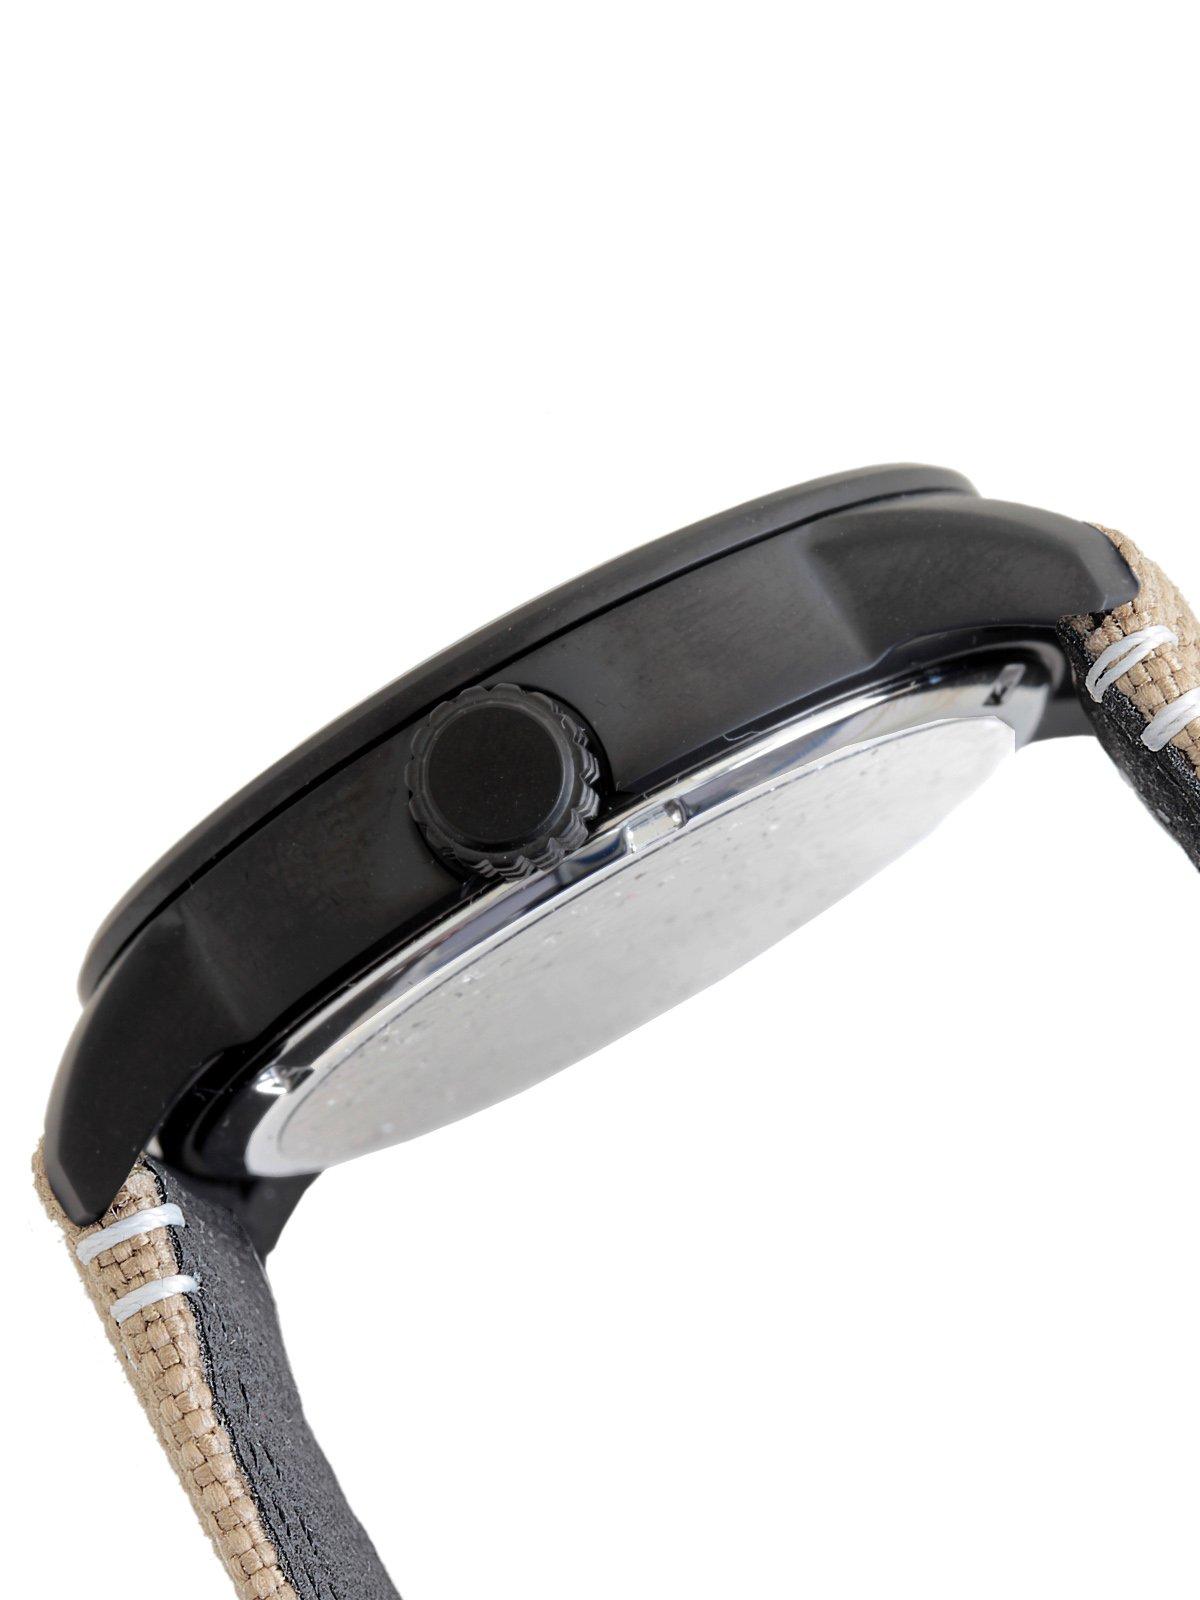 Citizen de hombre reloj de pulsera Elegance analógico de cuarzo, Eco Drive (Talla Única, Negro) 3